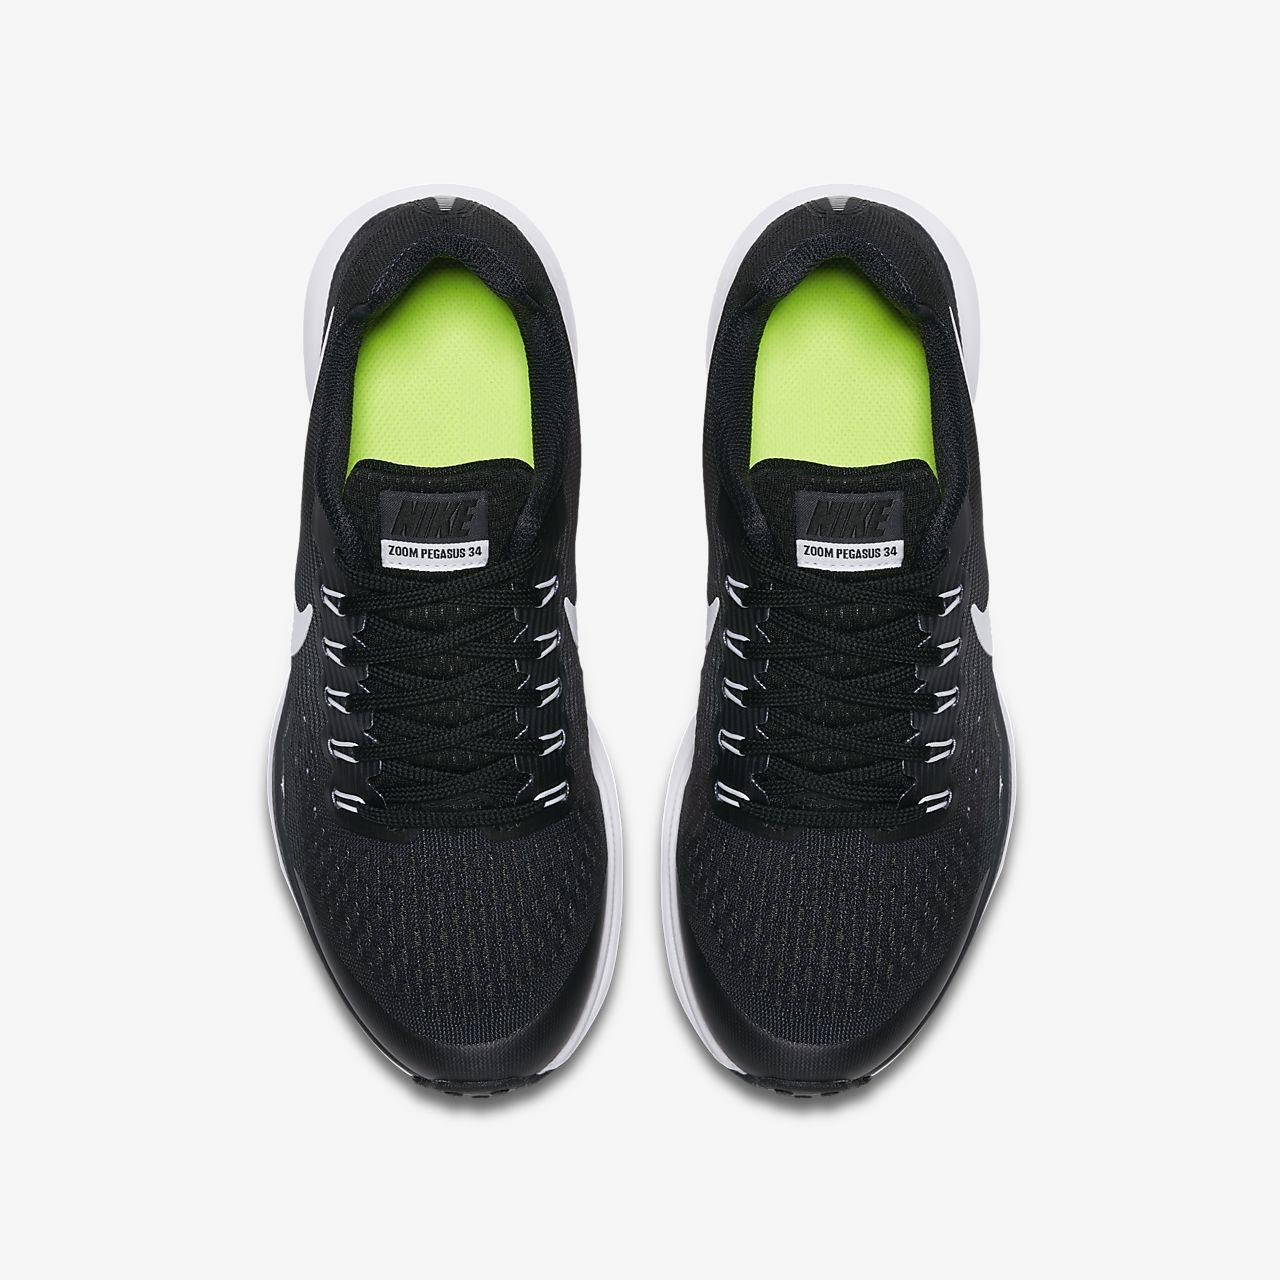 scarpe donna nike pegasus taglia 405